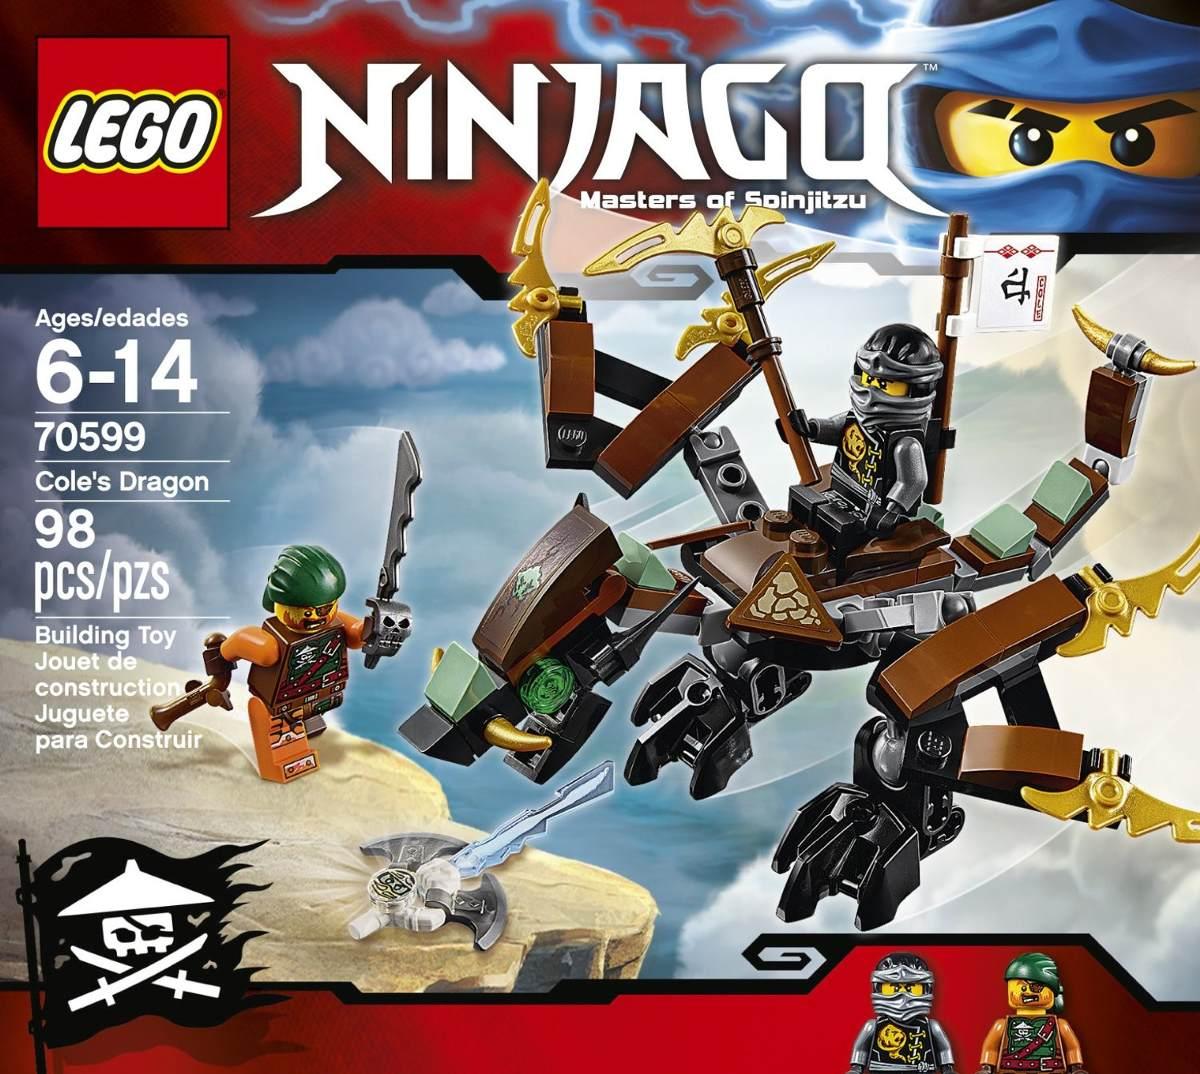 Lego De Dragon ColeMasters Of NinjagoEl Spinjitzu srthQd